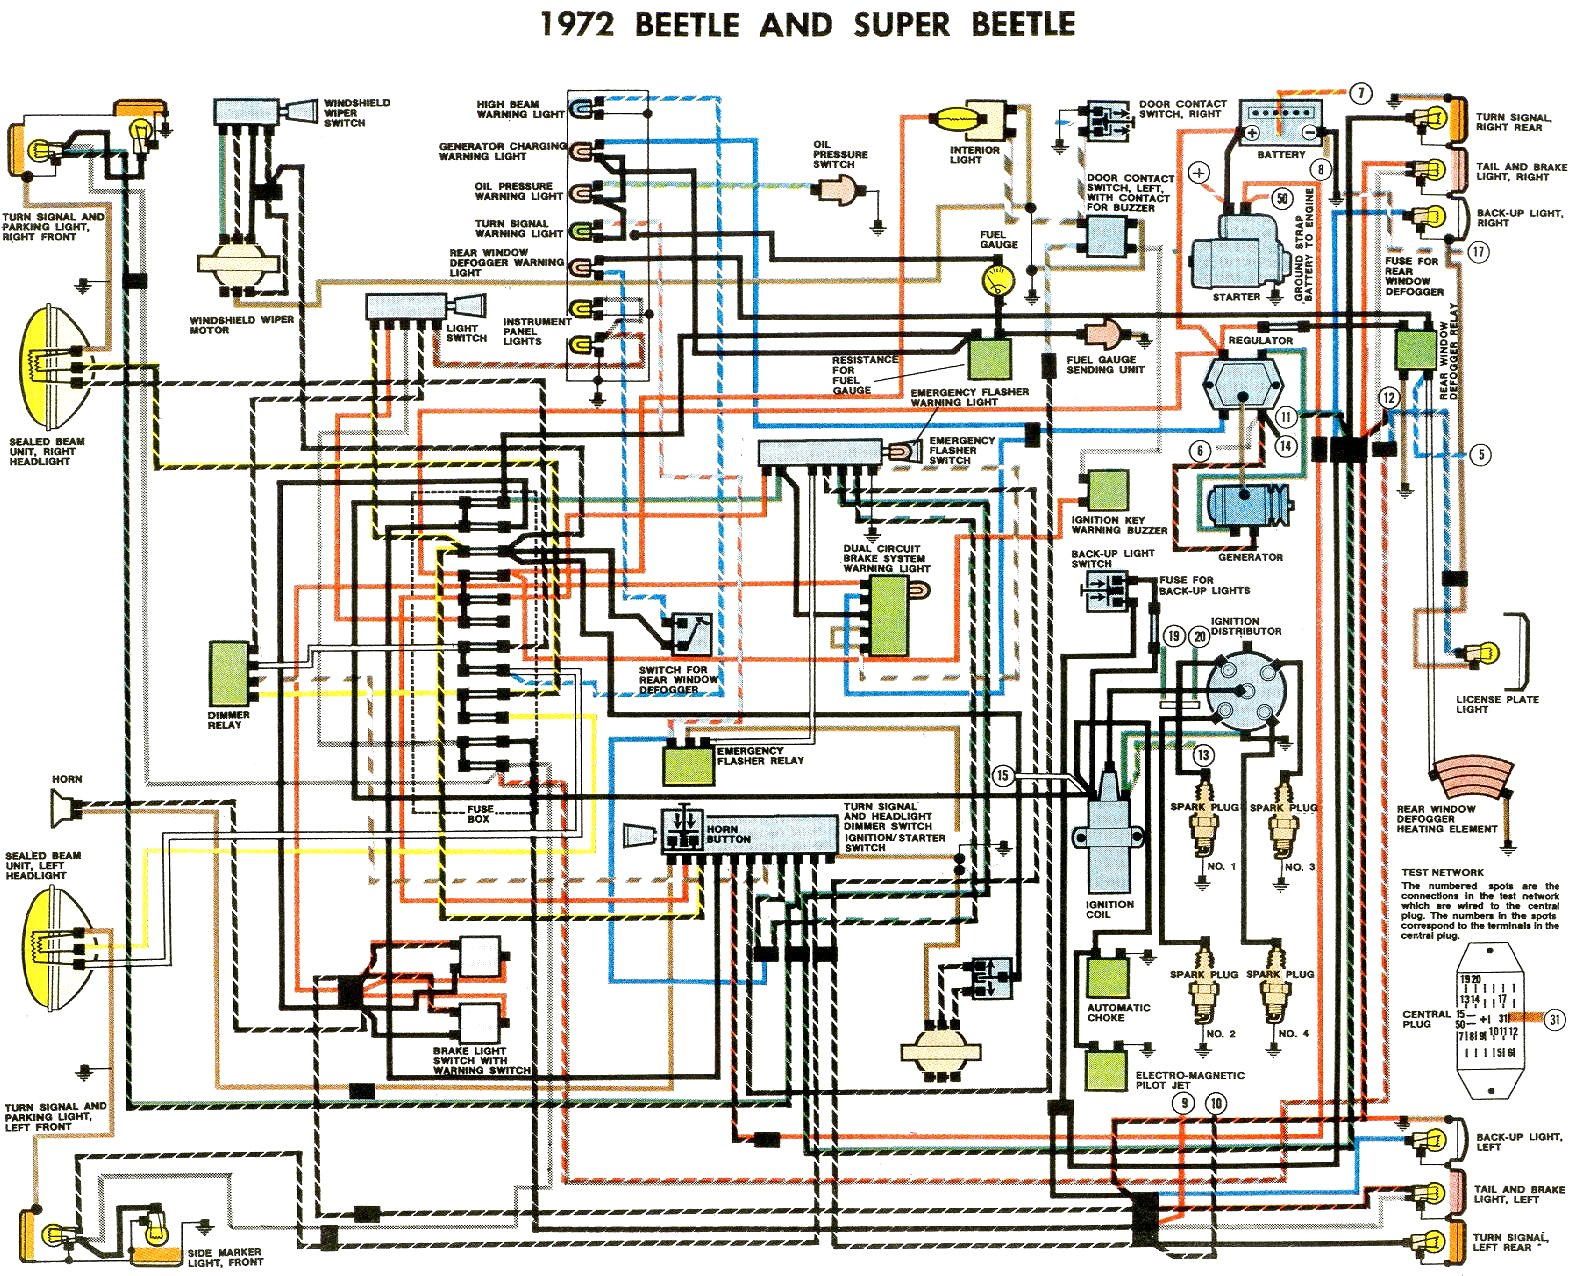 1971 vw wiring vw super beetle wiring harness image details  vw super beetle wiring harness image